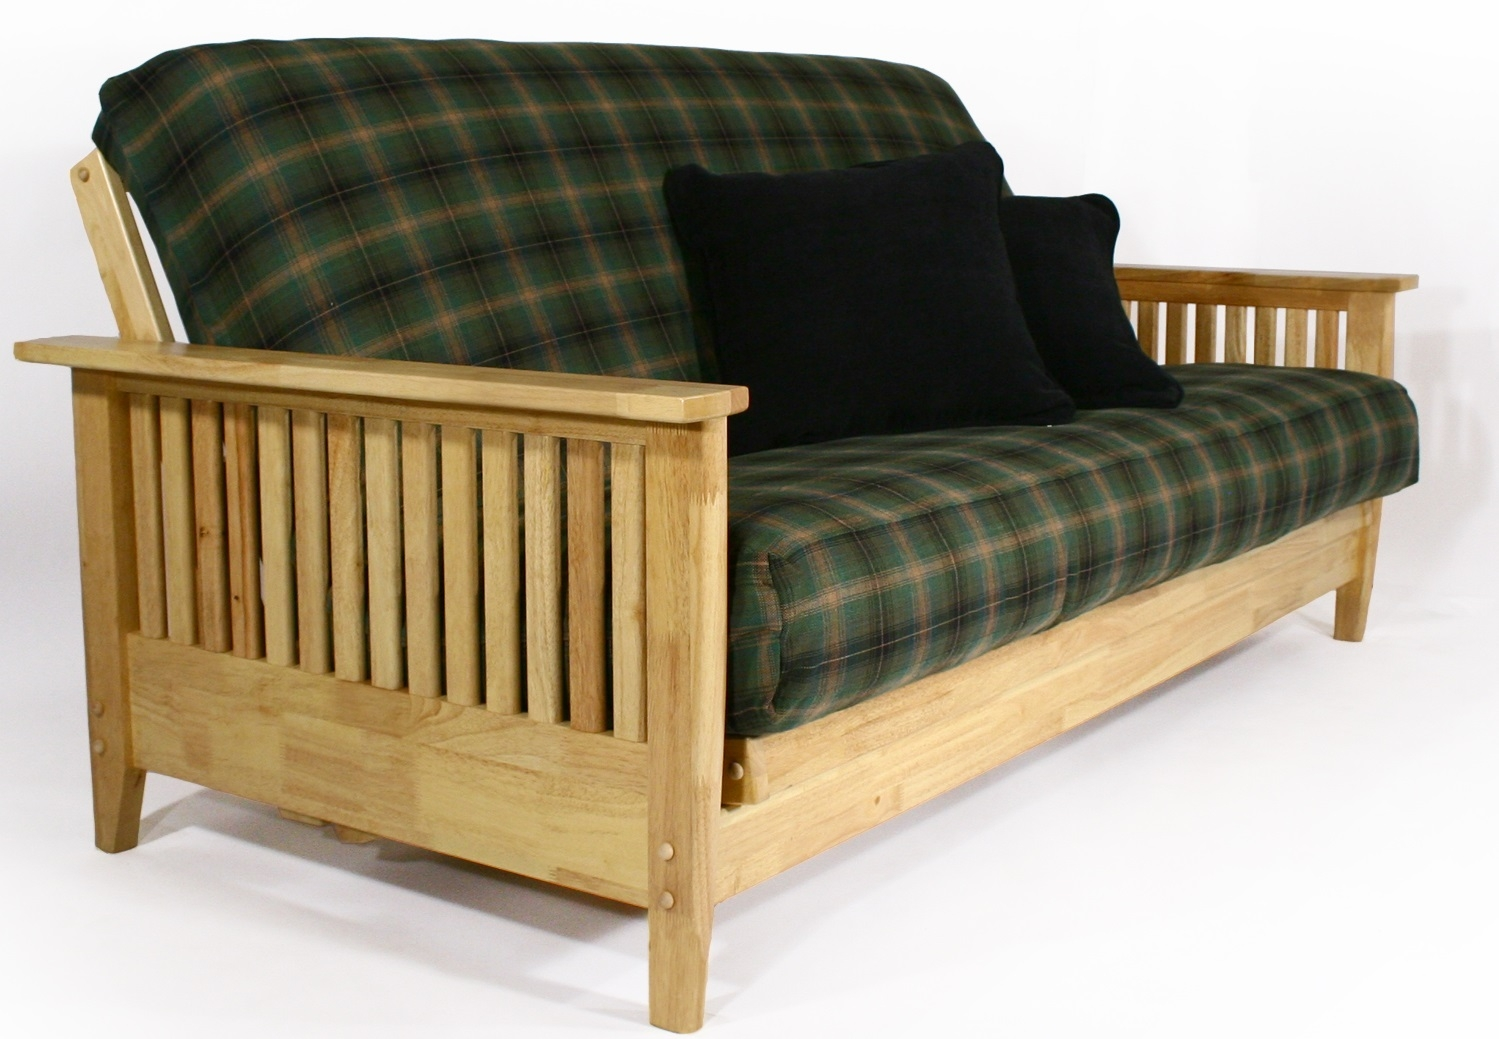 Denali Wooden Futon Sofa Bed